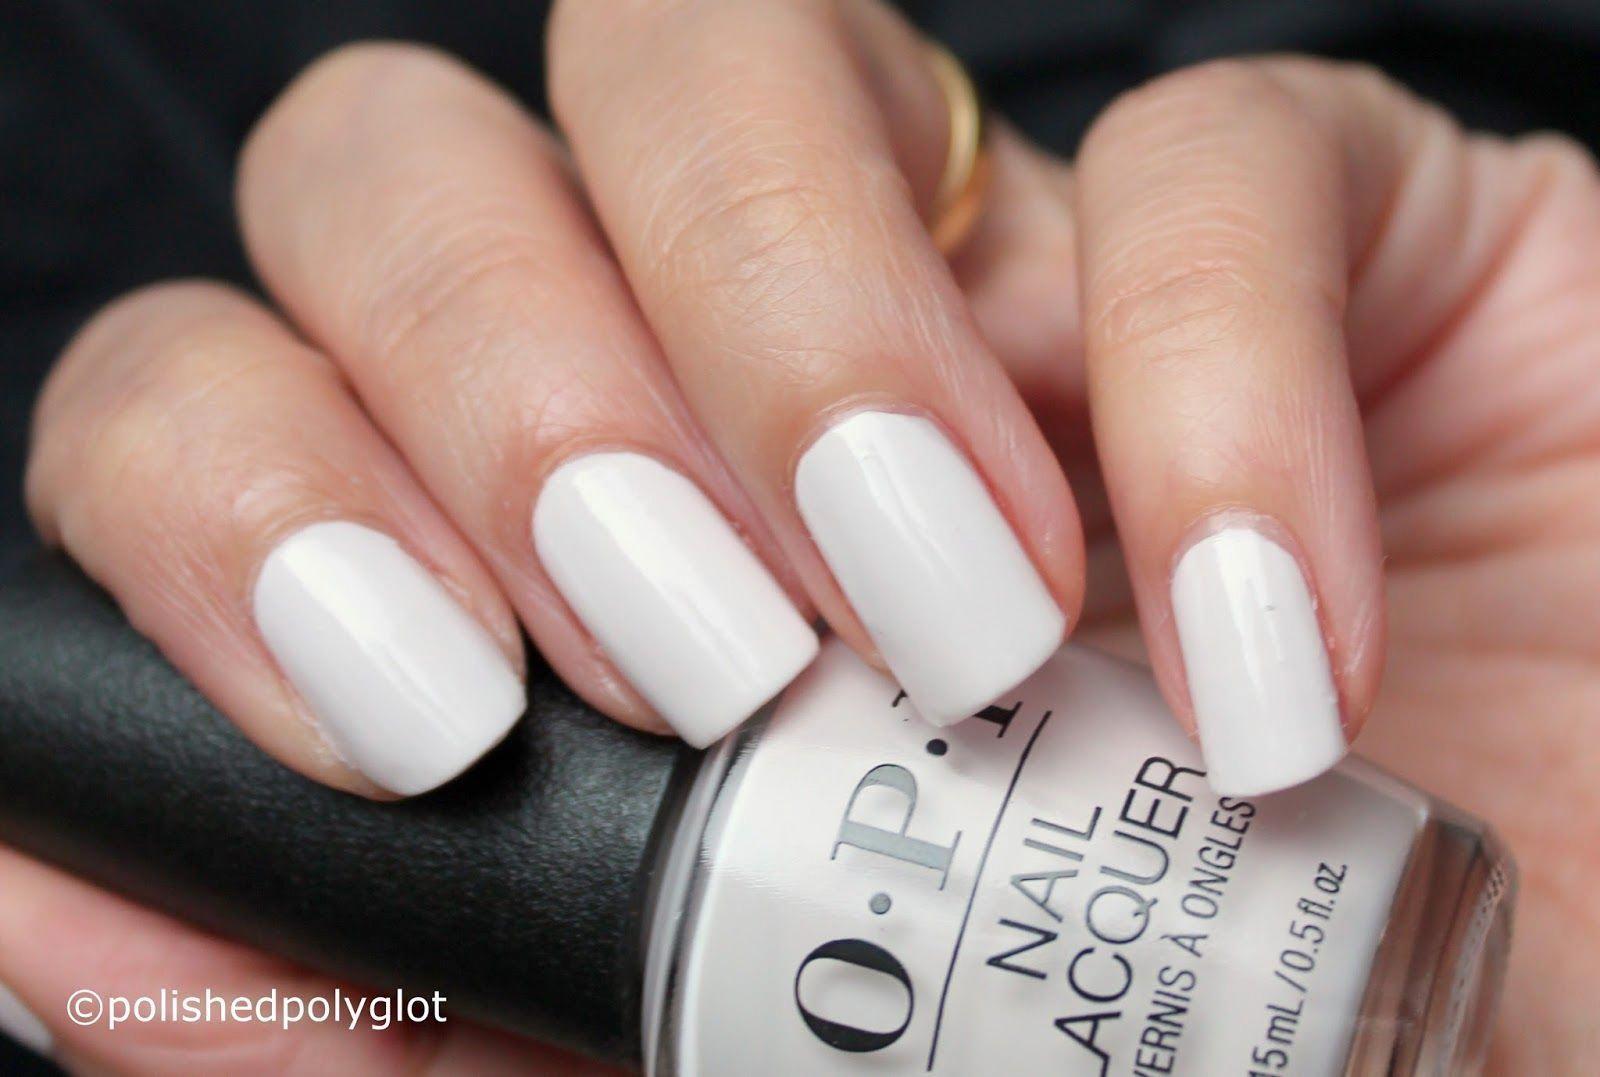 Finest Nail Colors Springnailcolors Nail Polish Colors Opi